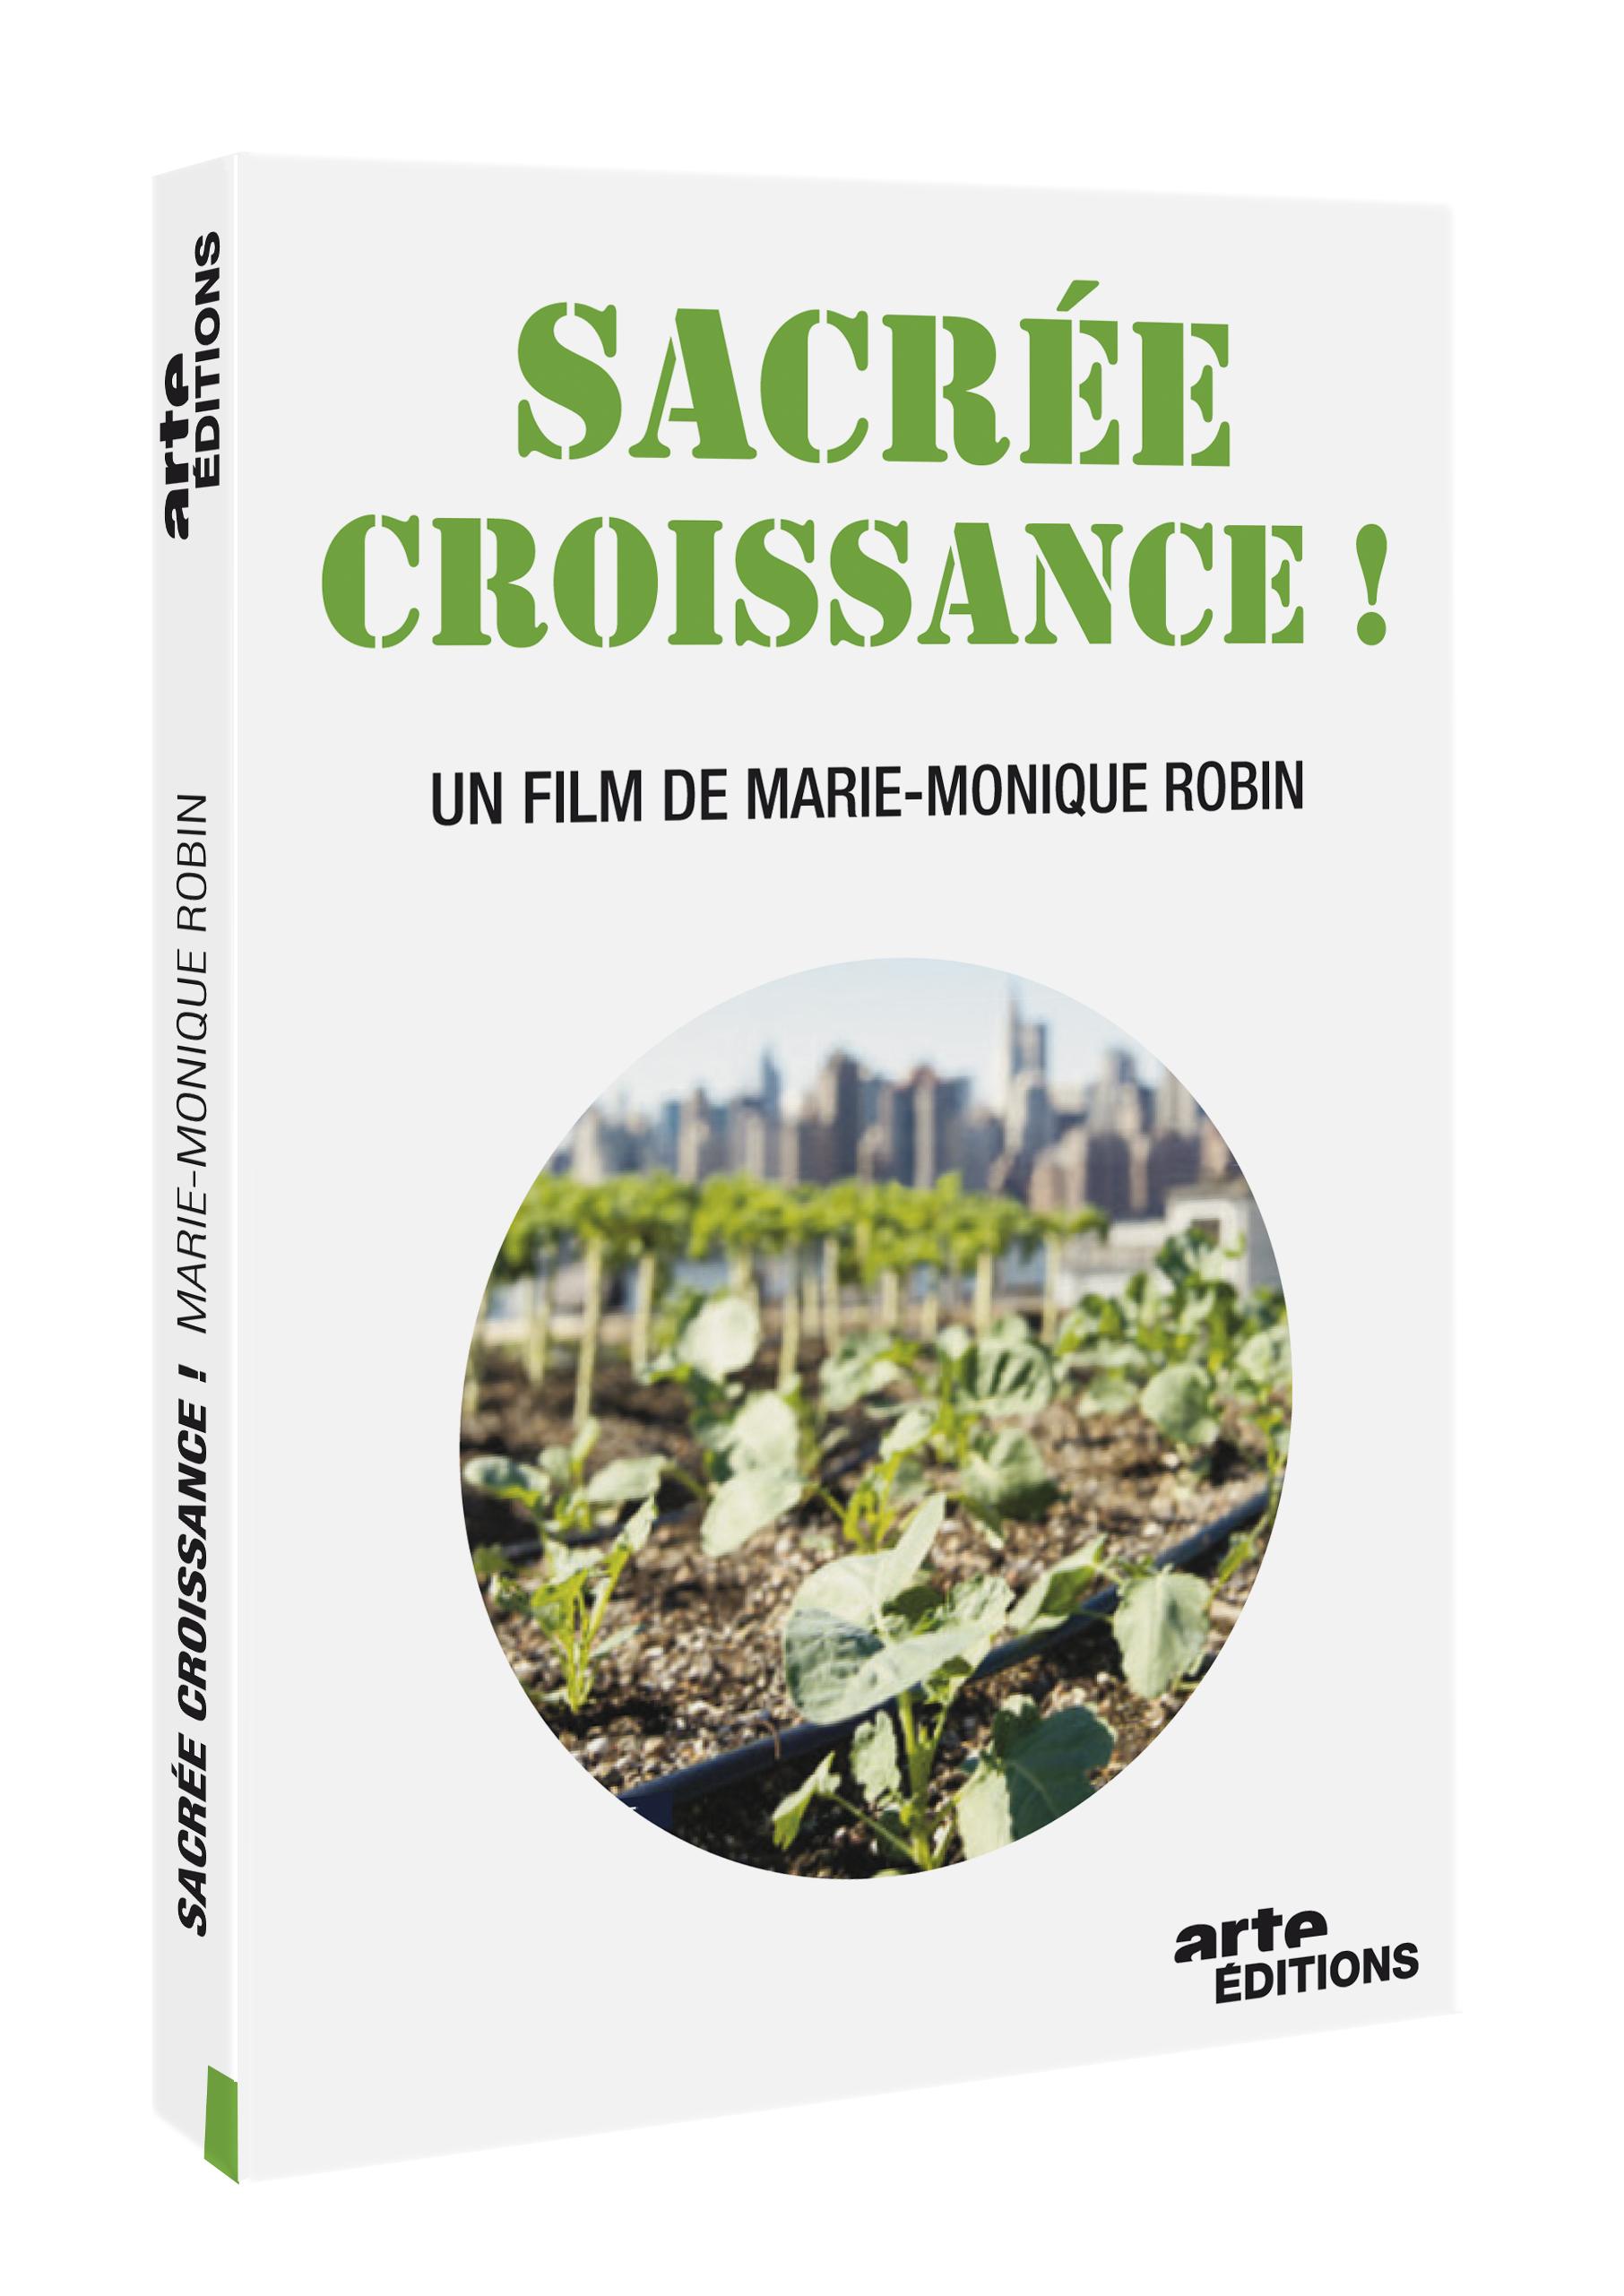 SACREE CROISSANCE - DVD